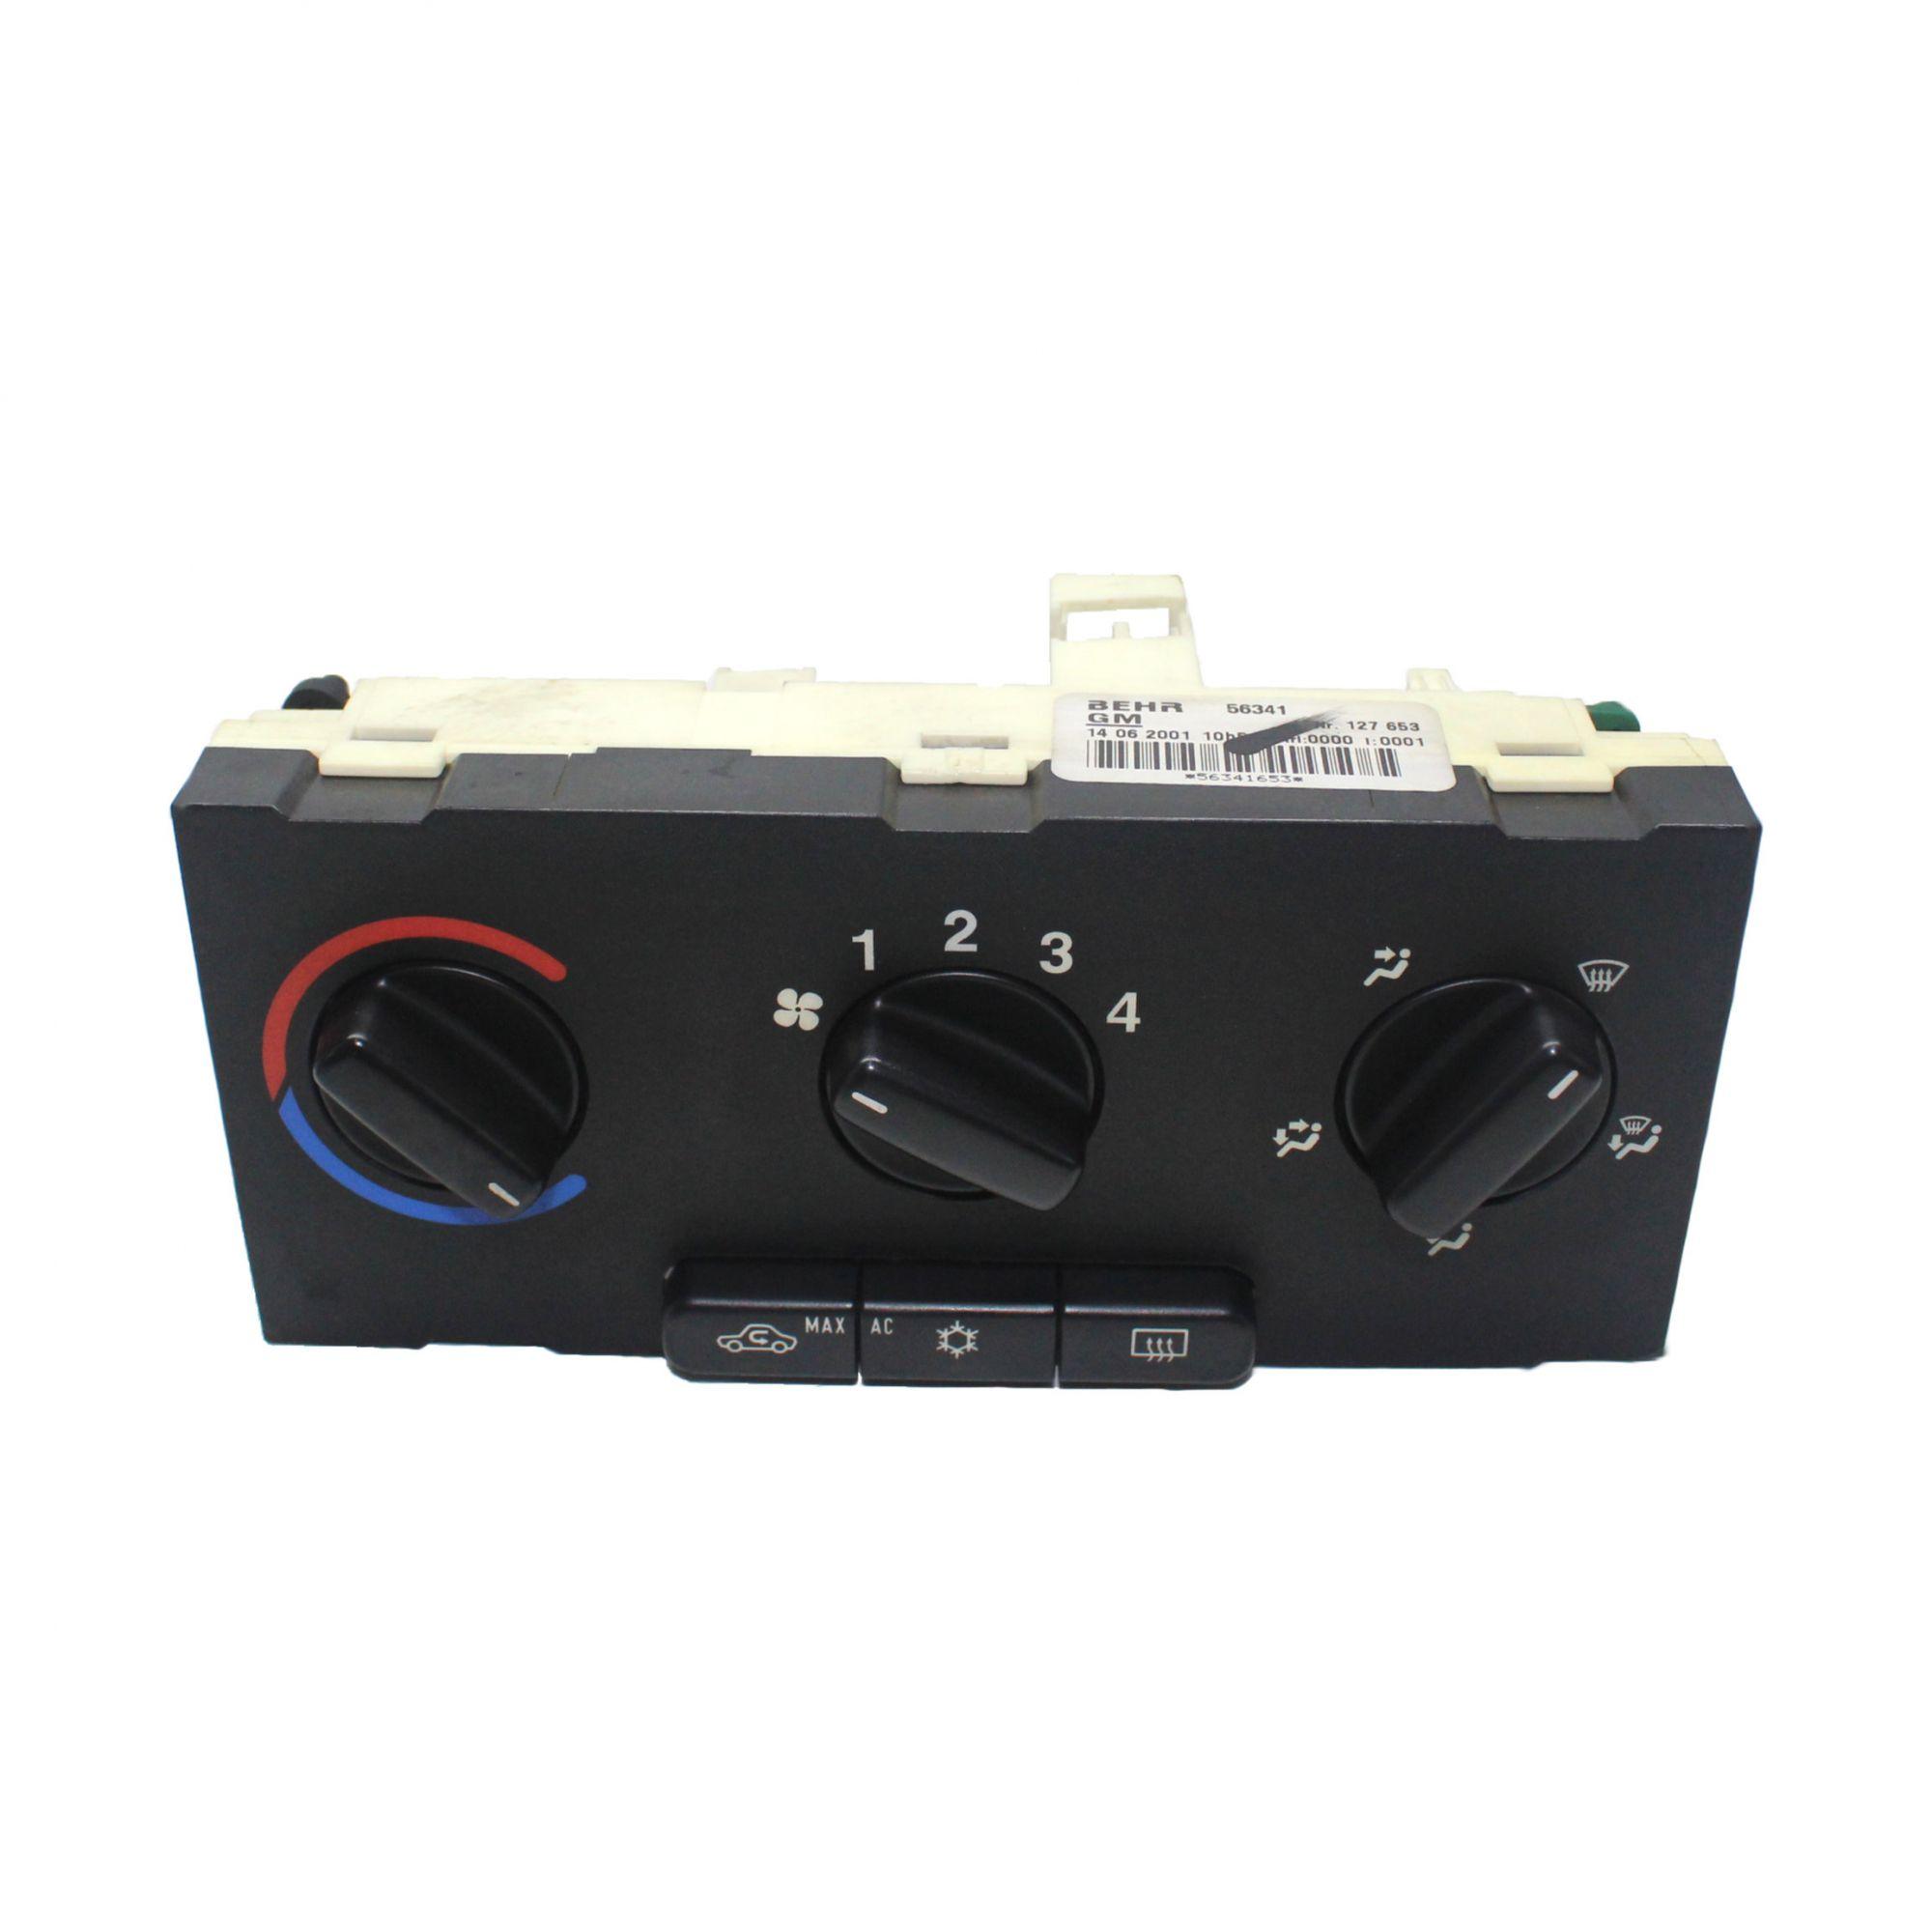 Comando Manual Ar Condicionado BEHR Zafira - Usado